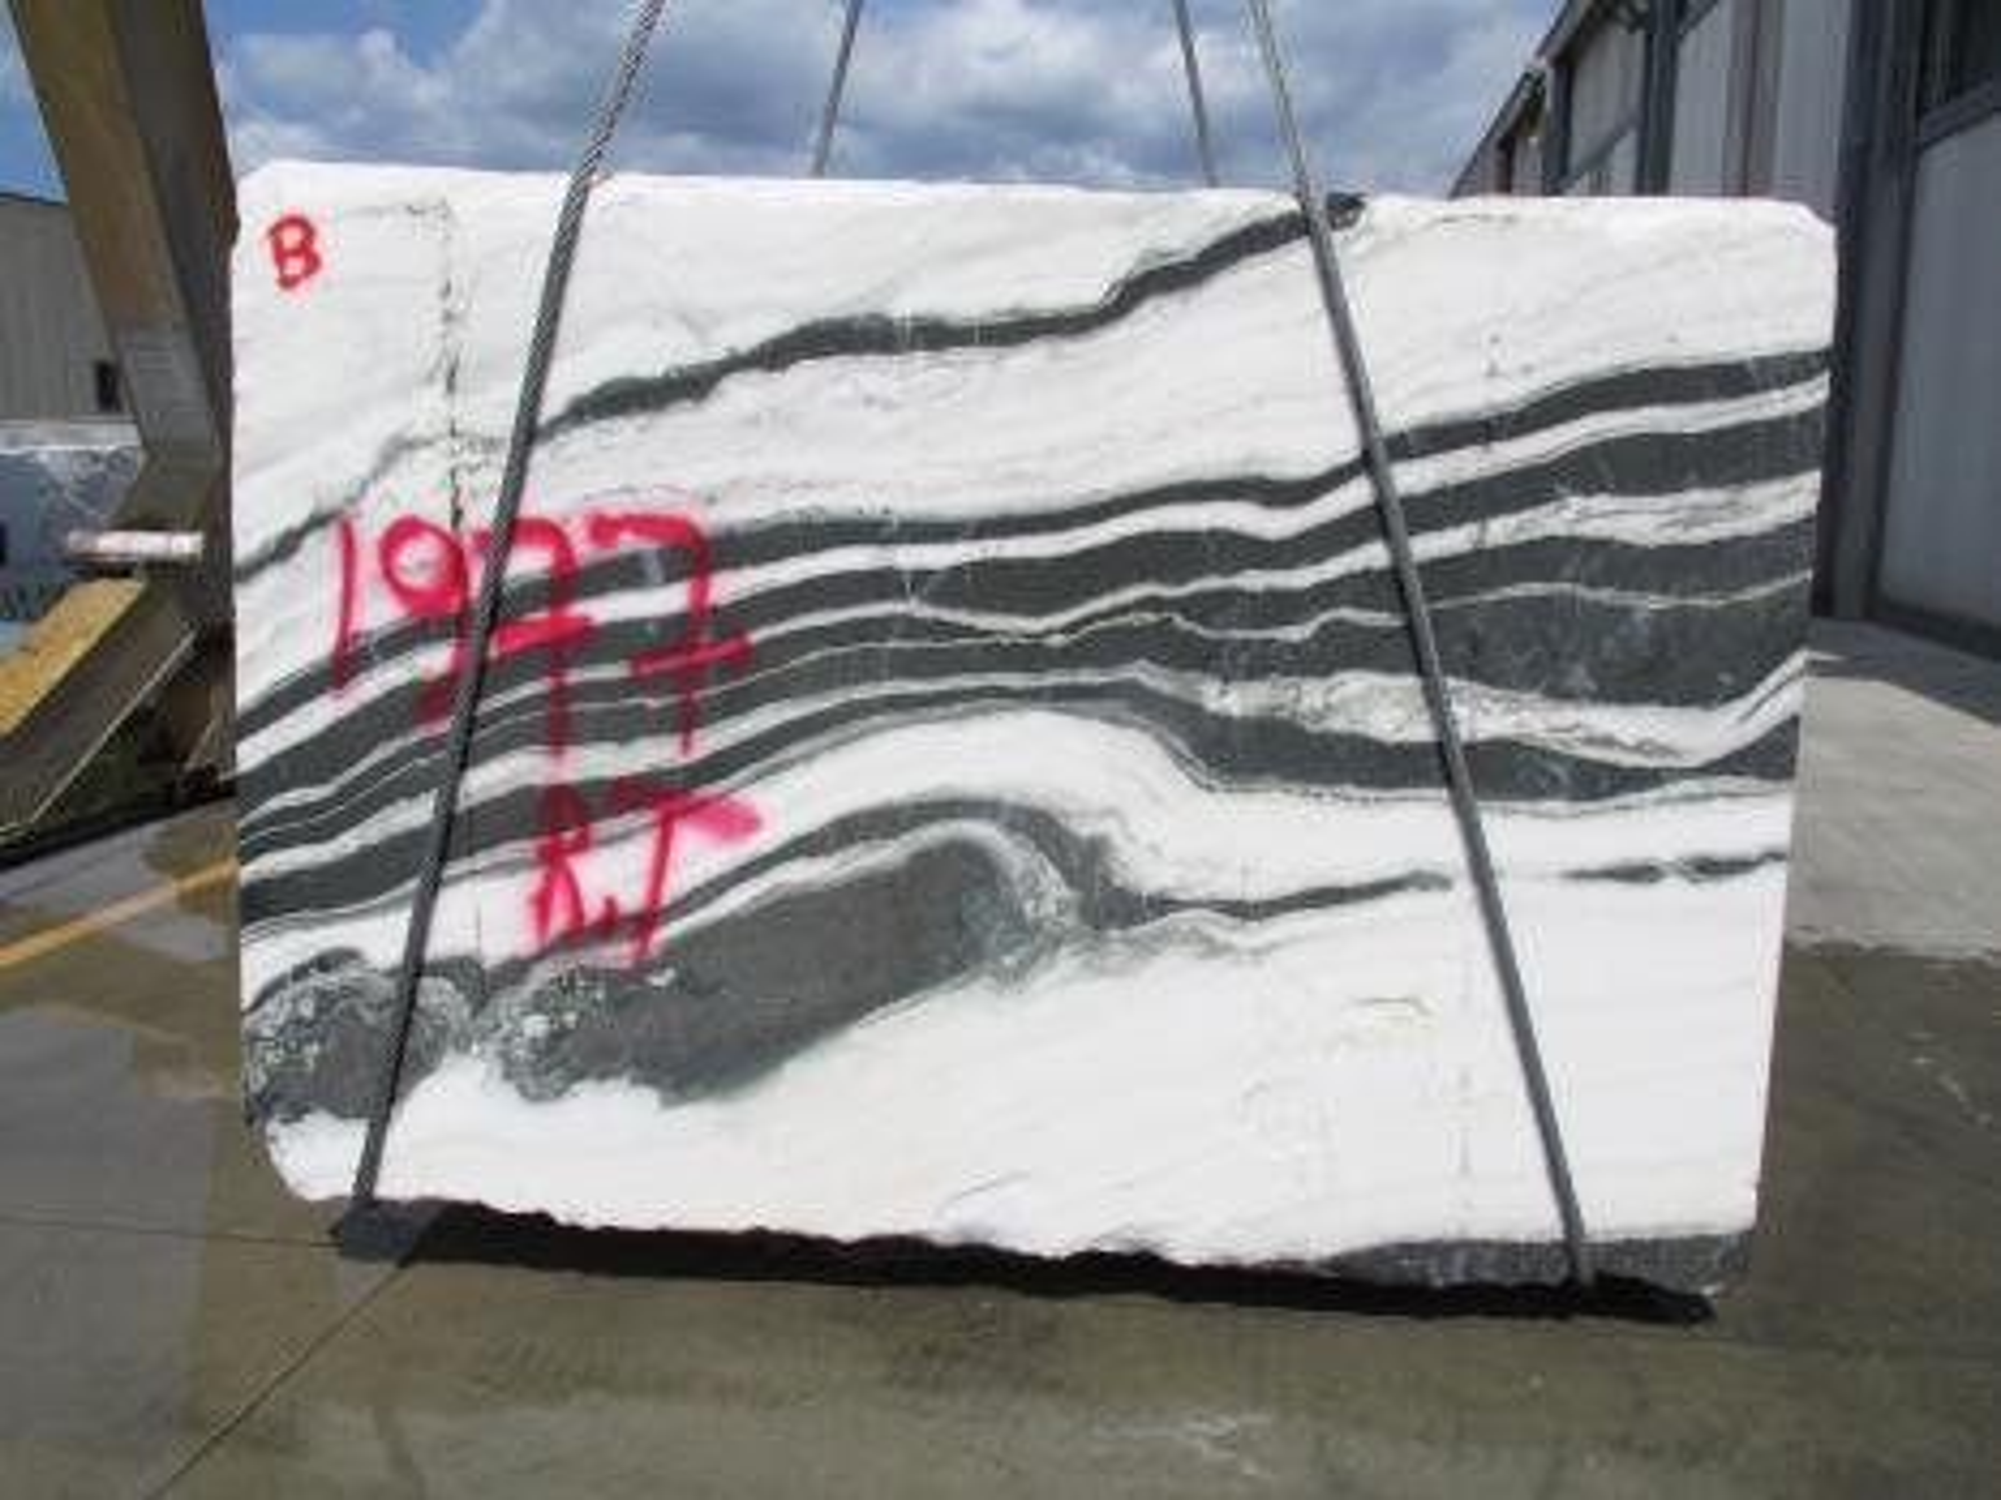 PANDA rohe Blöcke 1771M aus Natur Marmor , Face B: Lieferung Veneto, Italien